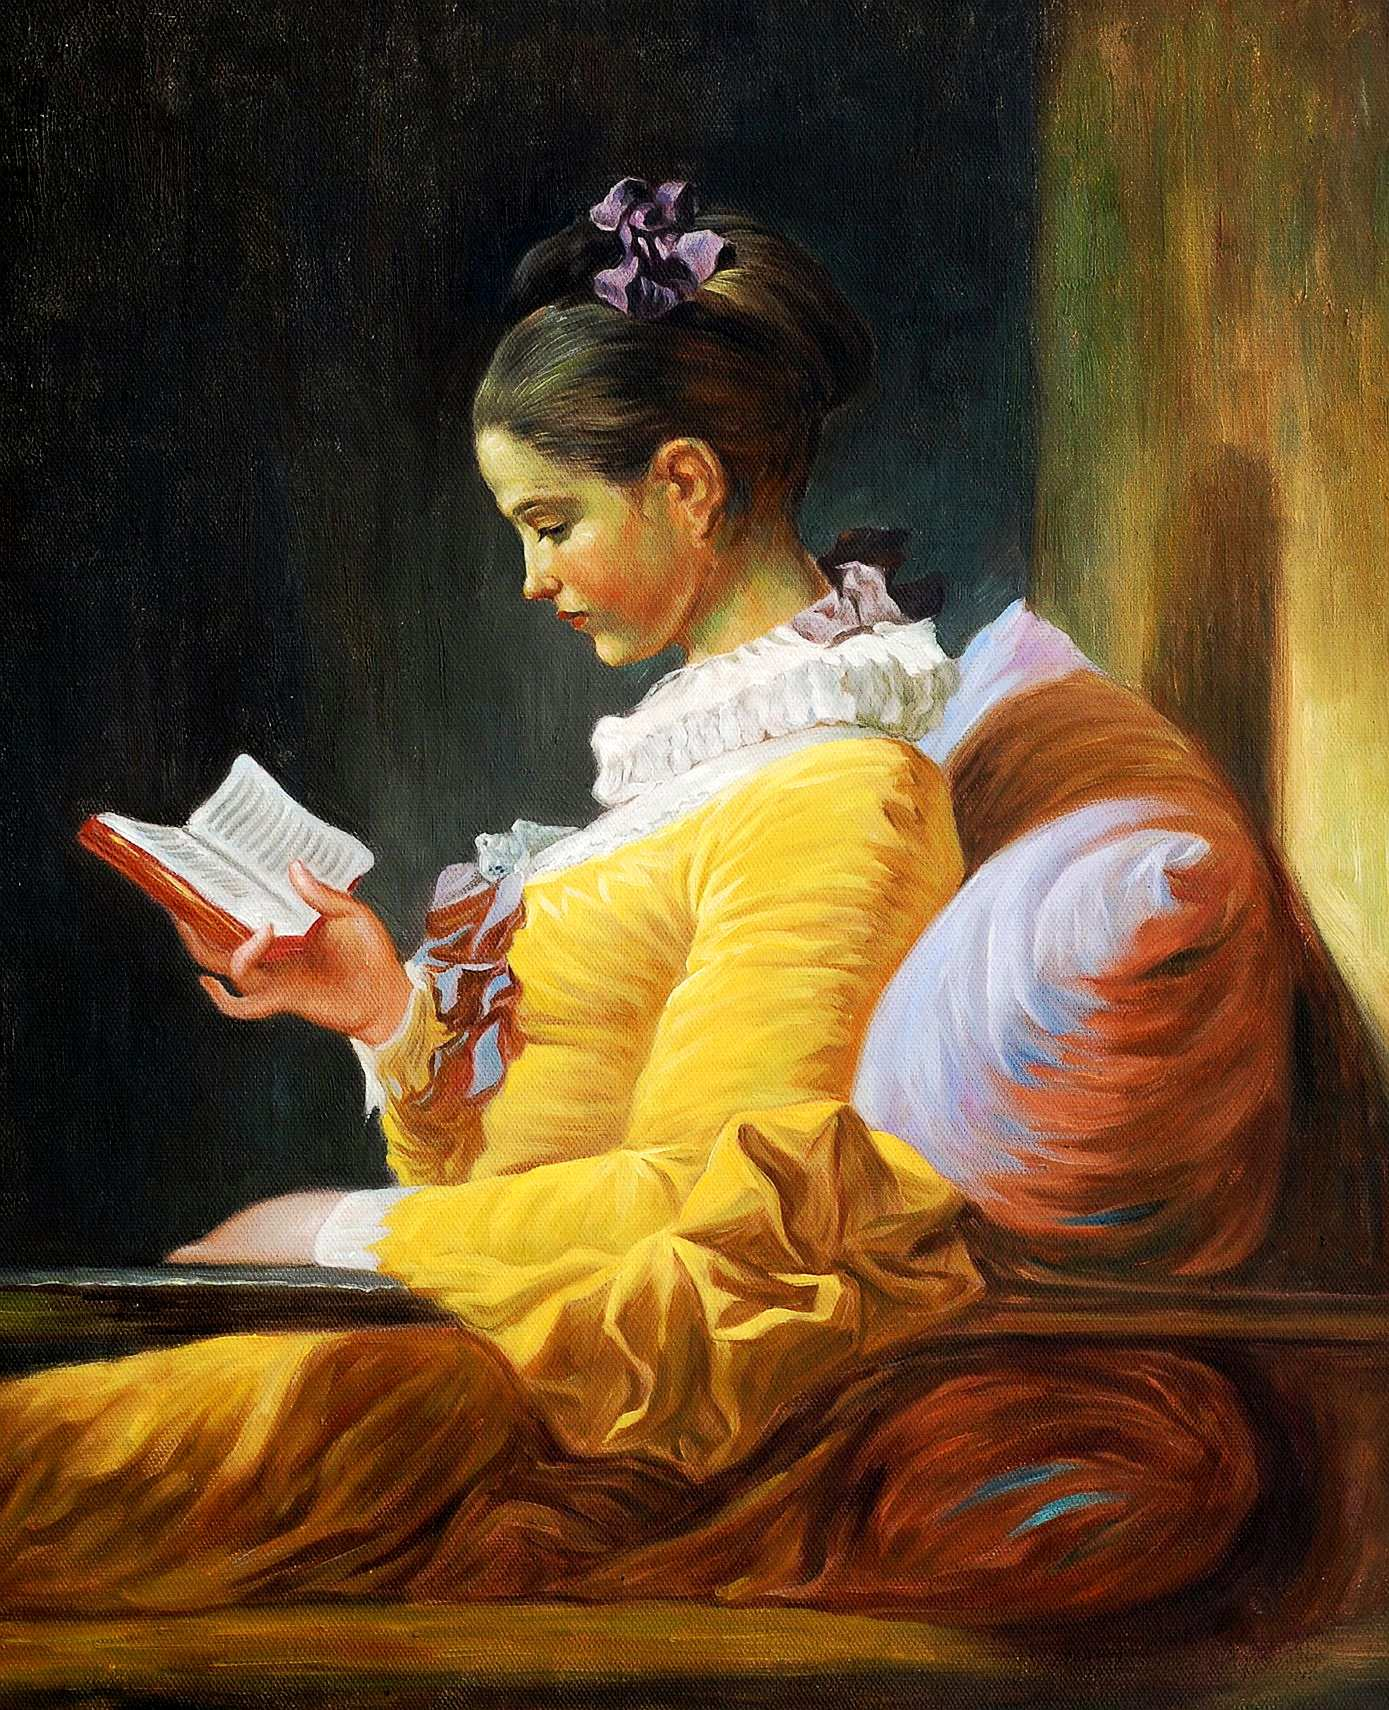 Jean Honoré Fragonard - Lesendes Mädchen b95713 40x50cm exzellentes Ölbild Museumsqualität